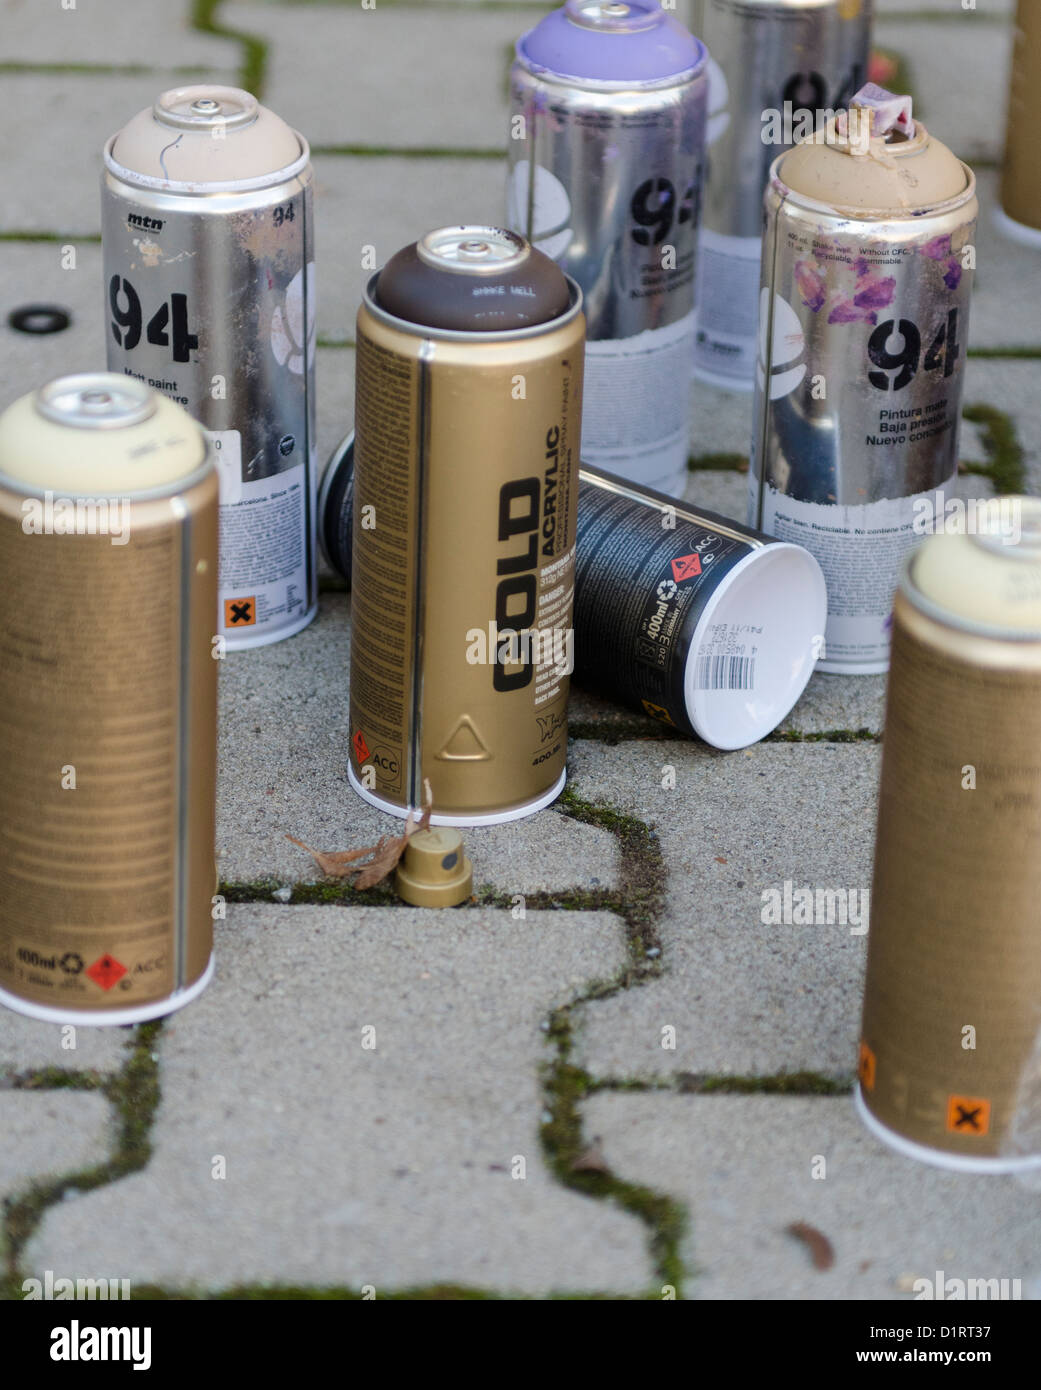 Bombe 94 Montana avec spray kunst stock photos & spray kunst stock images - alamy